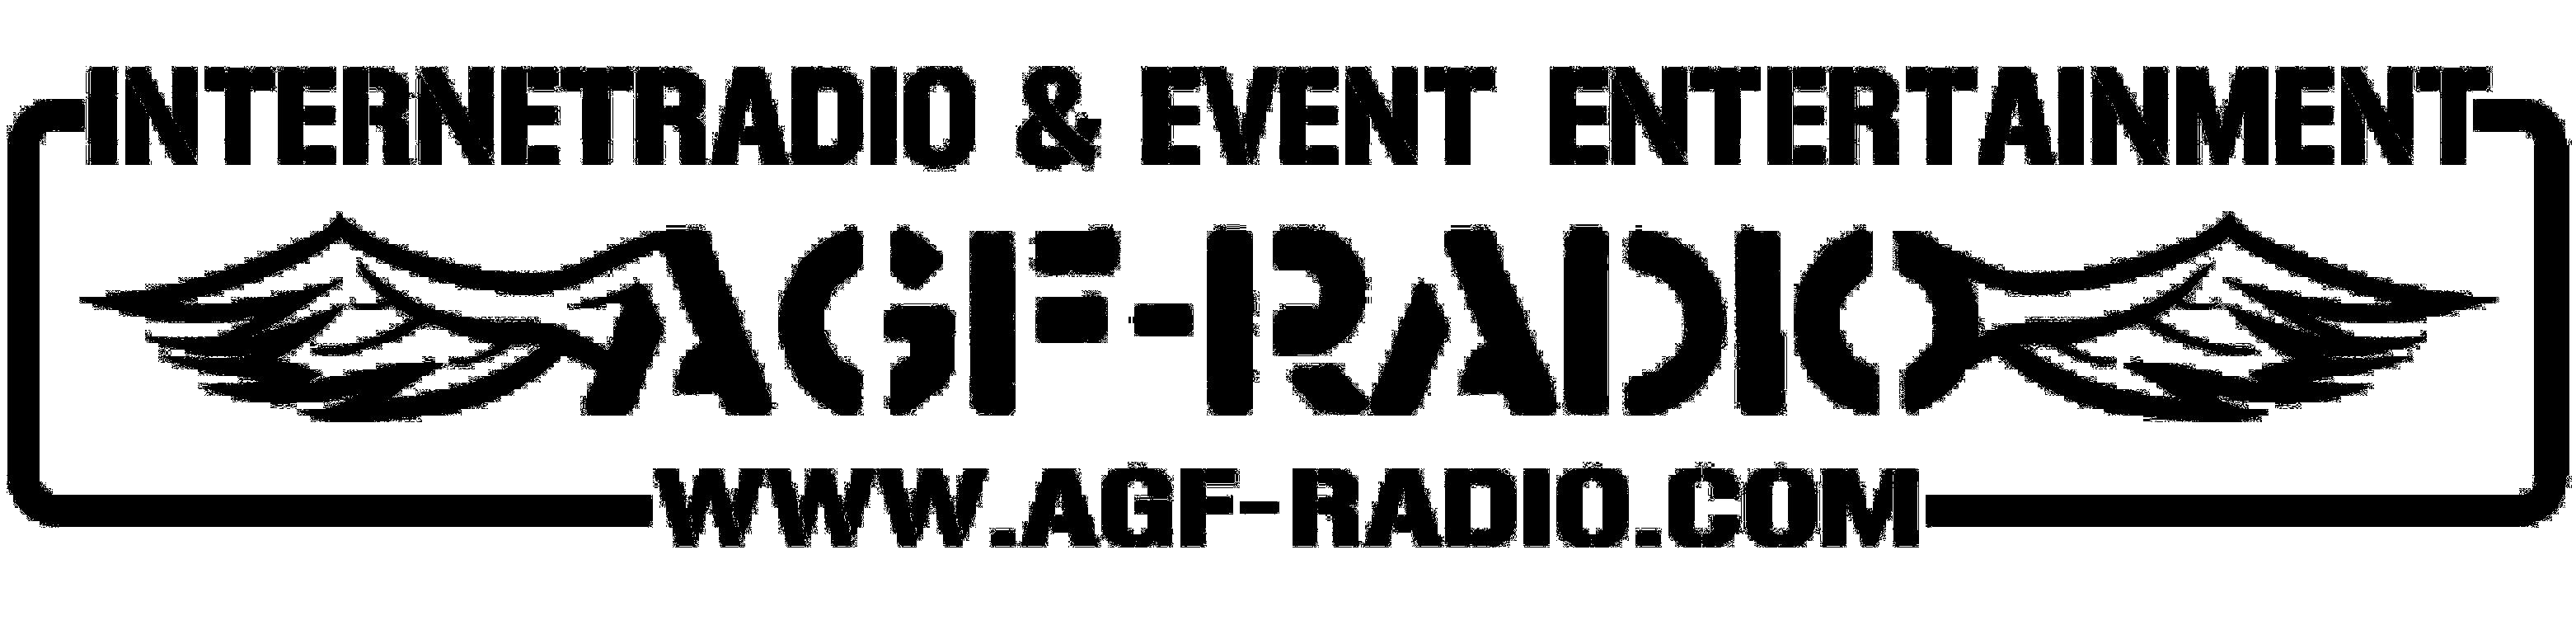 agf-radio_logo8